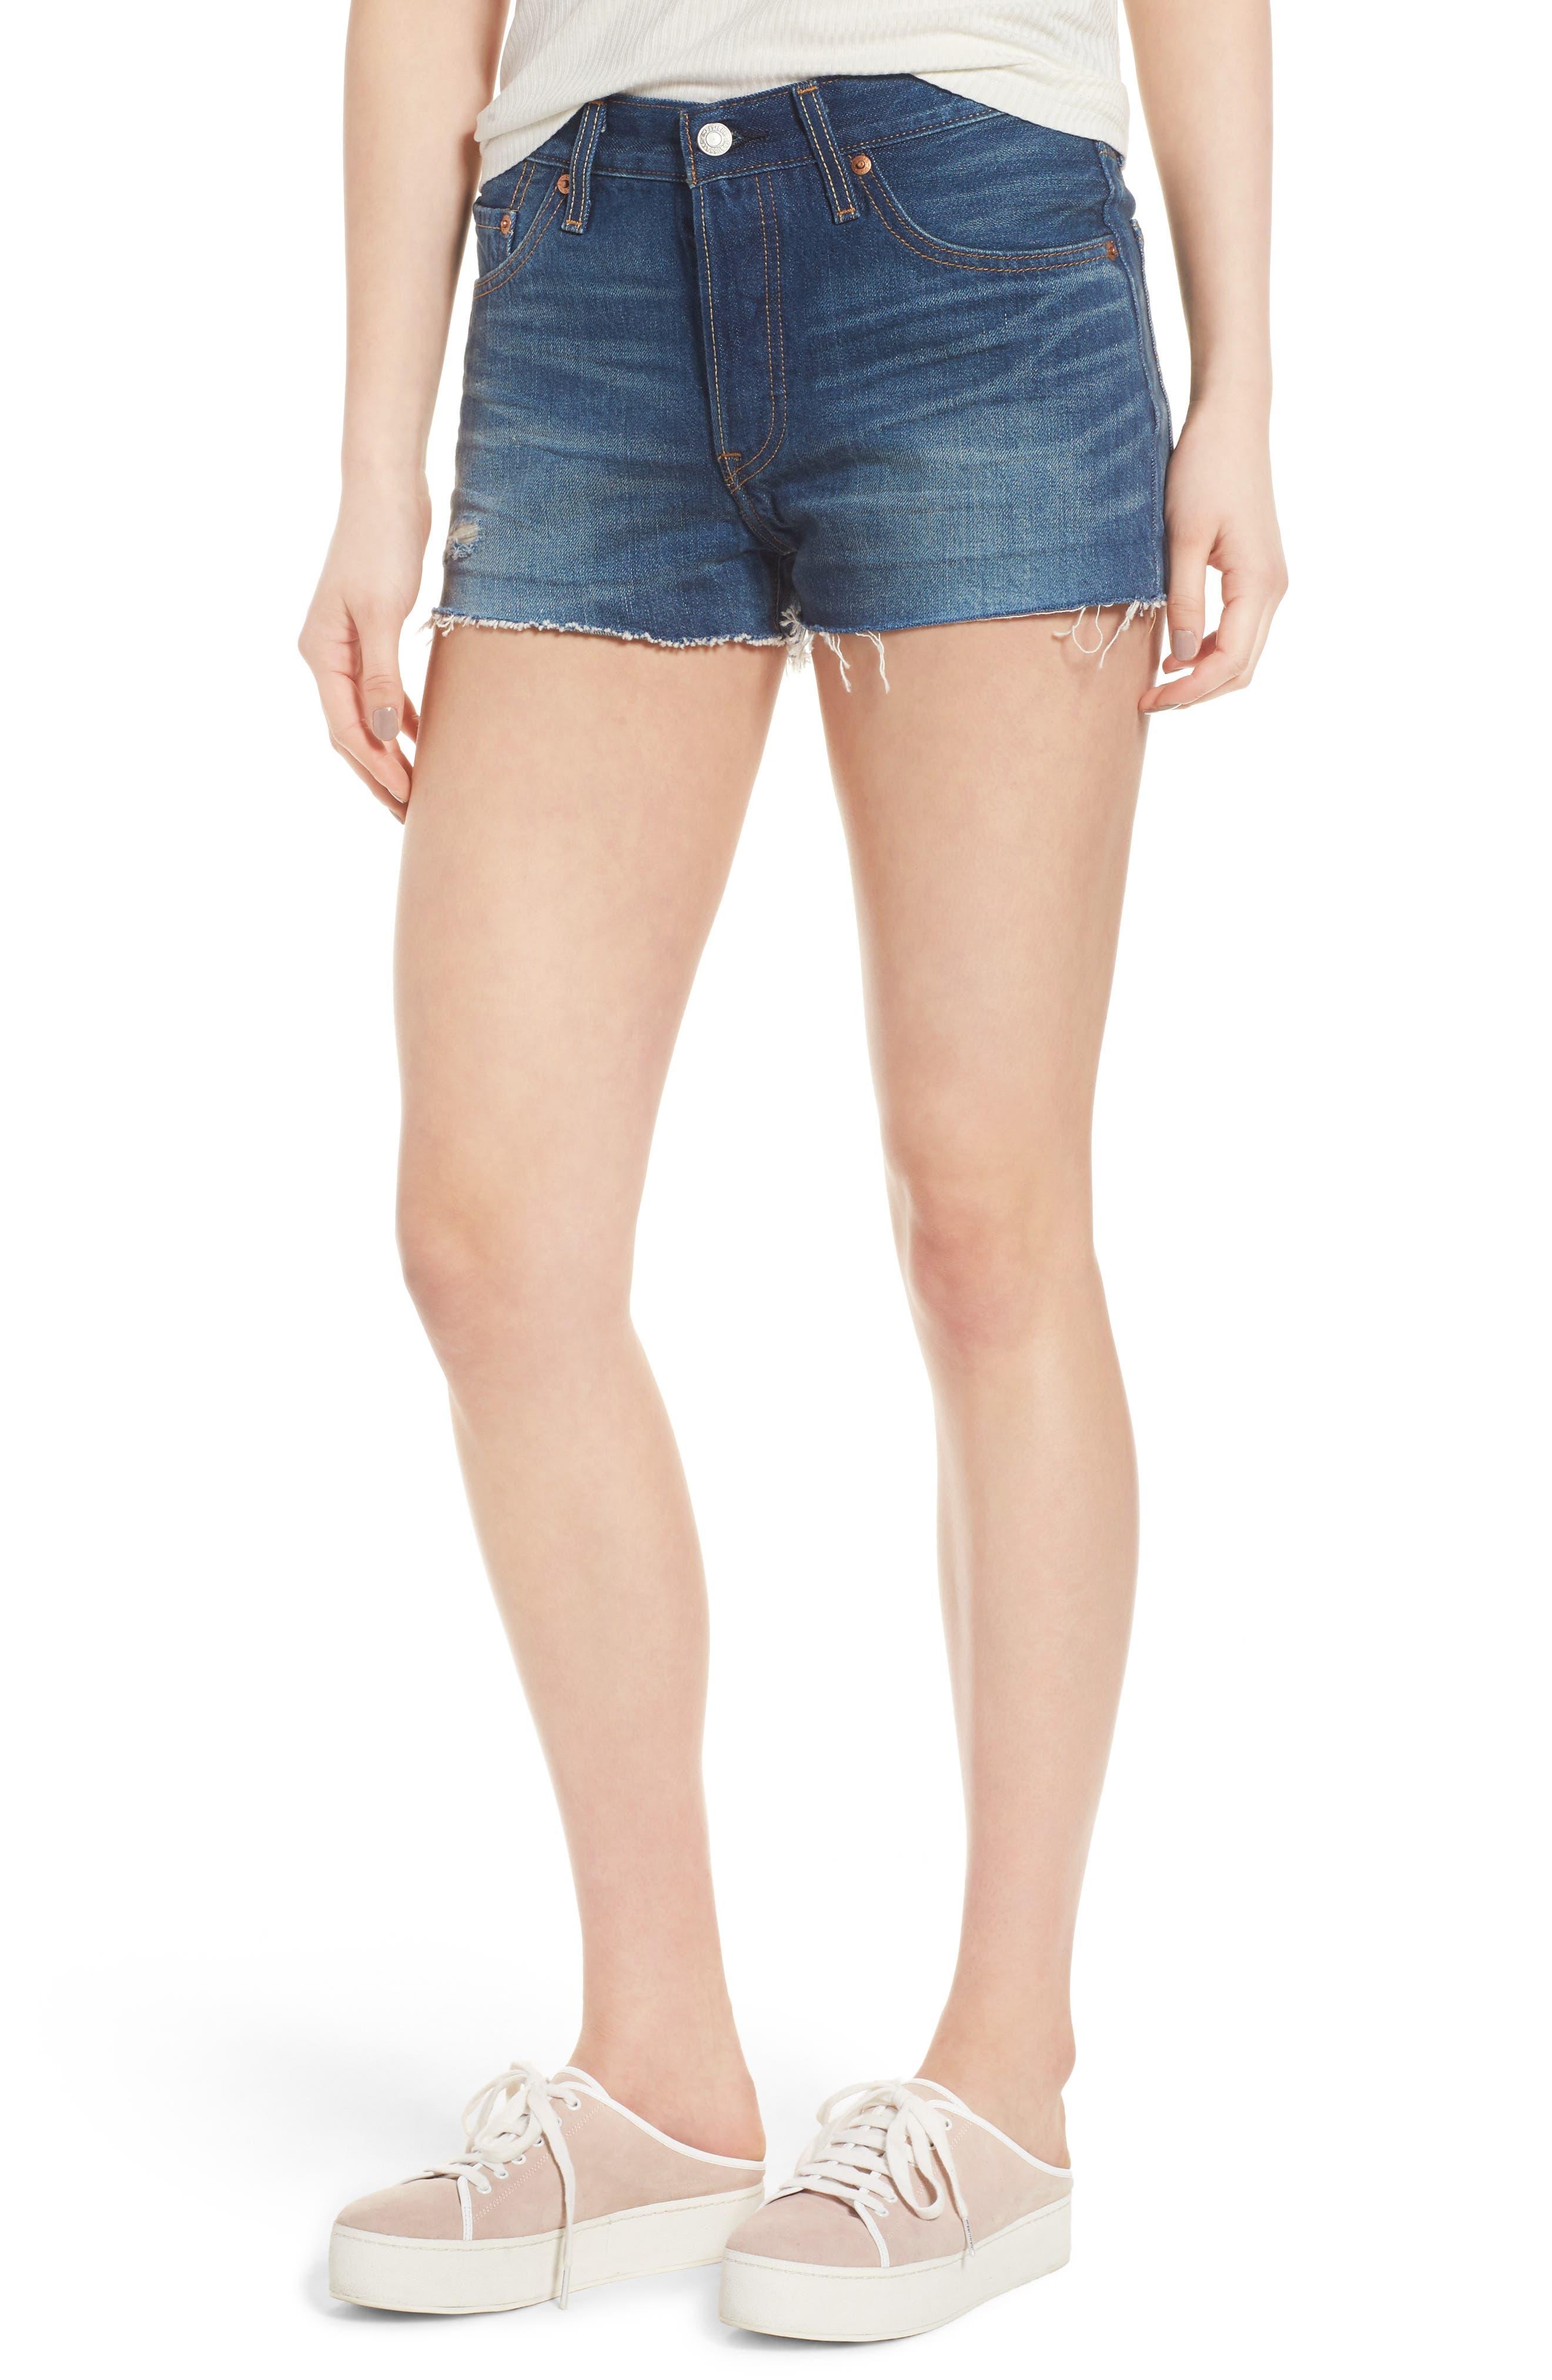 Alternate Image 1 Selected - Levi's® 501® Cutoff Denim Shorts (California Tide)